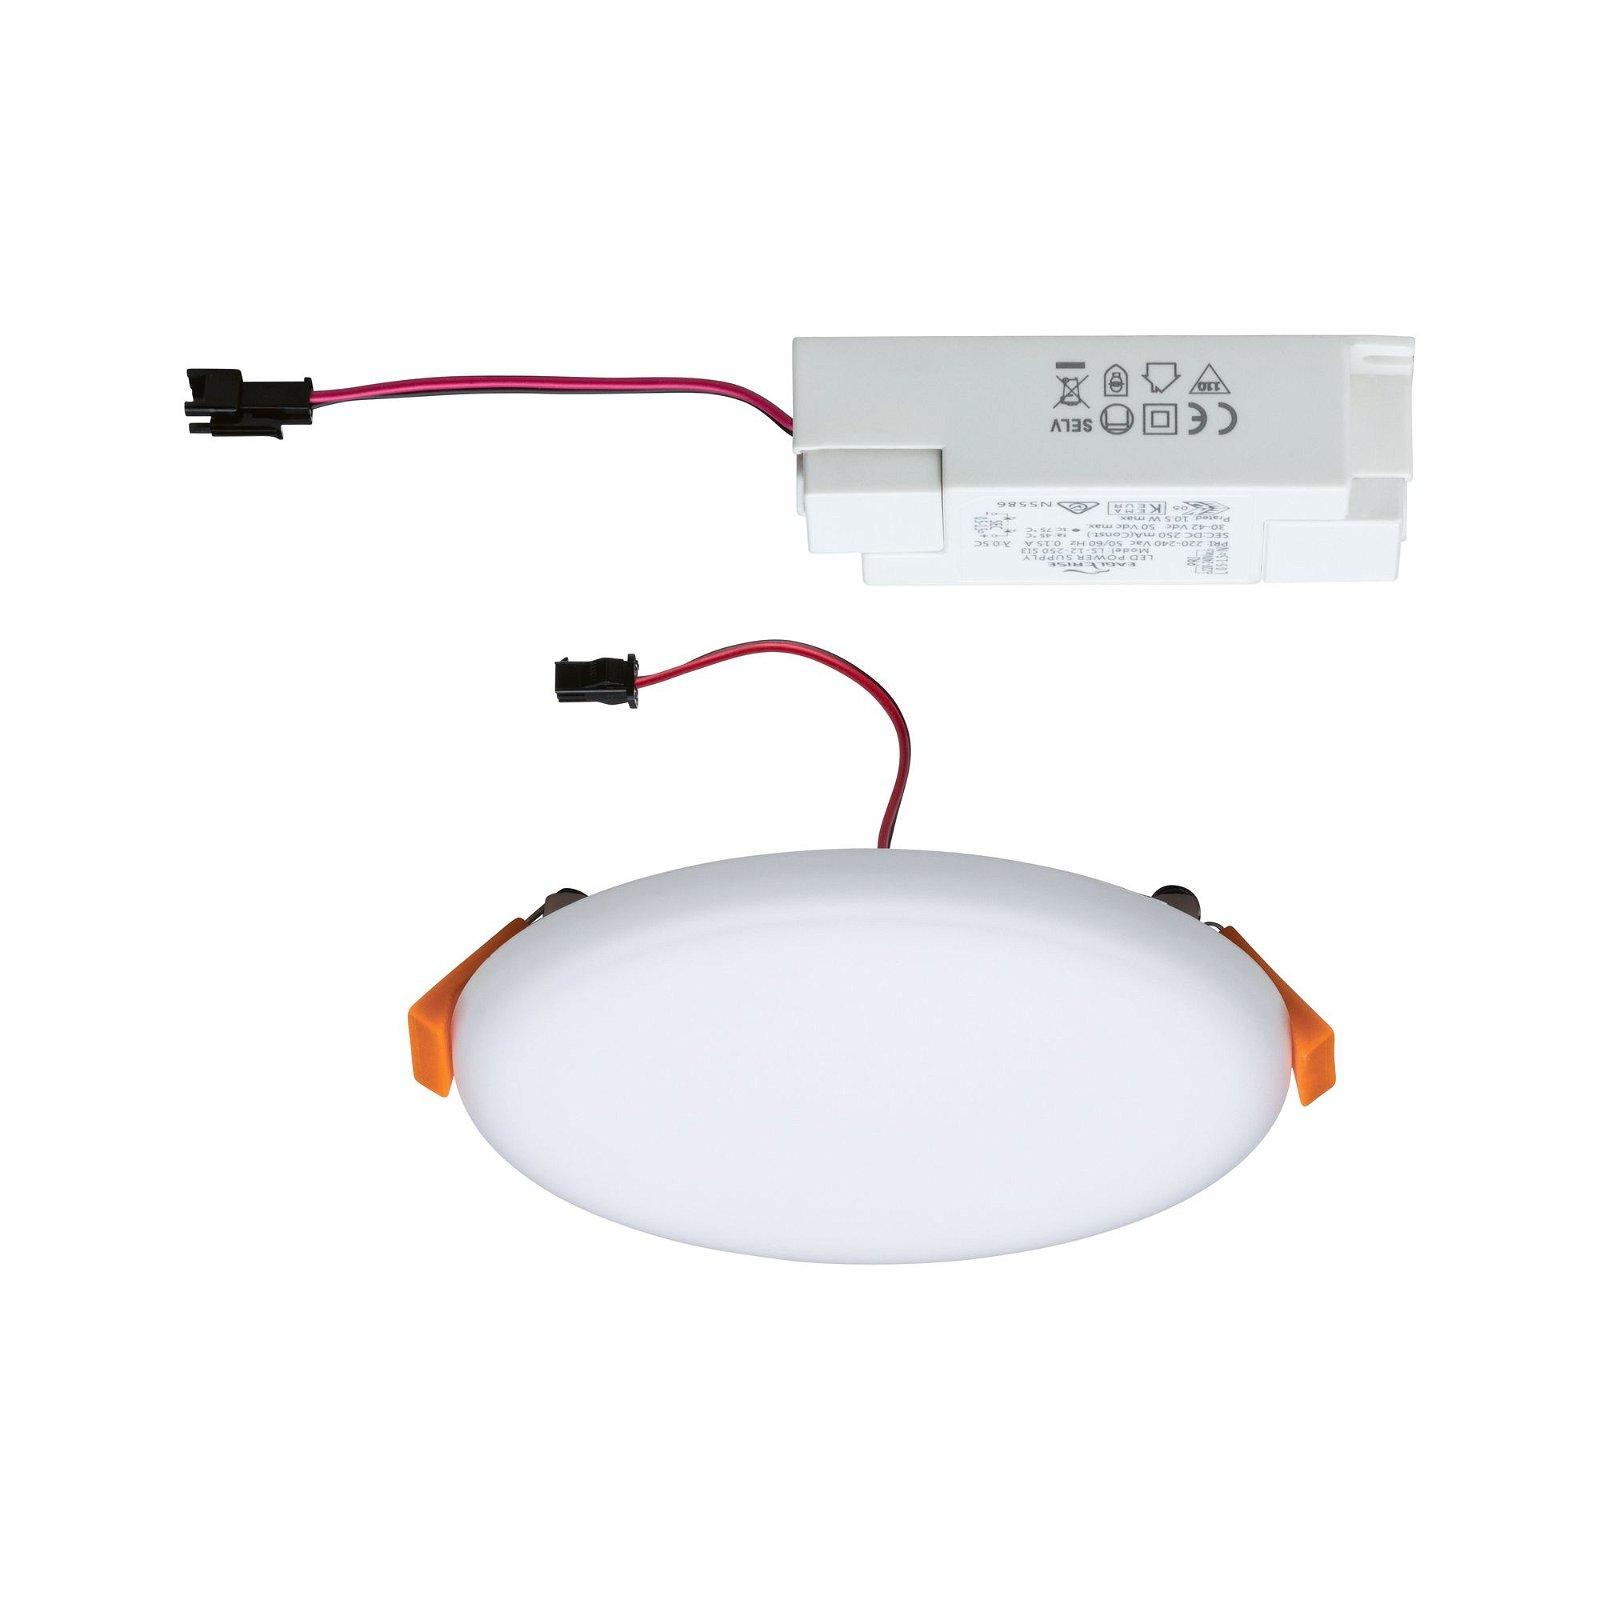 VariFit LED Einbaupanel Veluna IP44 IP44 rund 125mm 3000K Satin